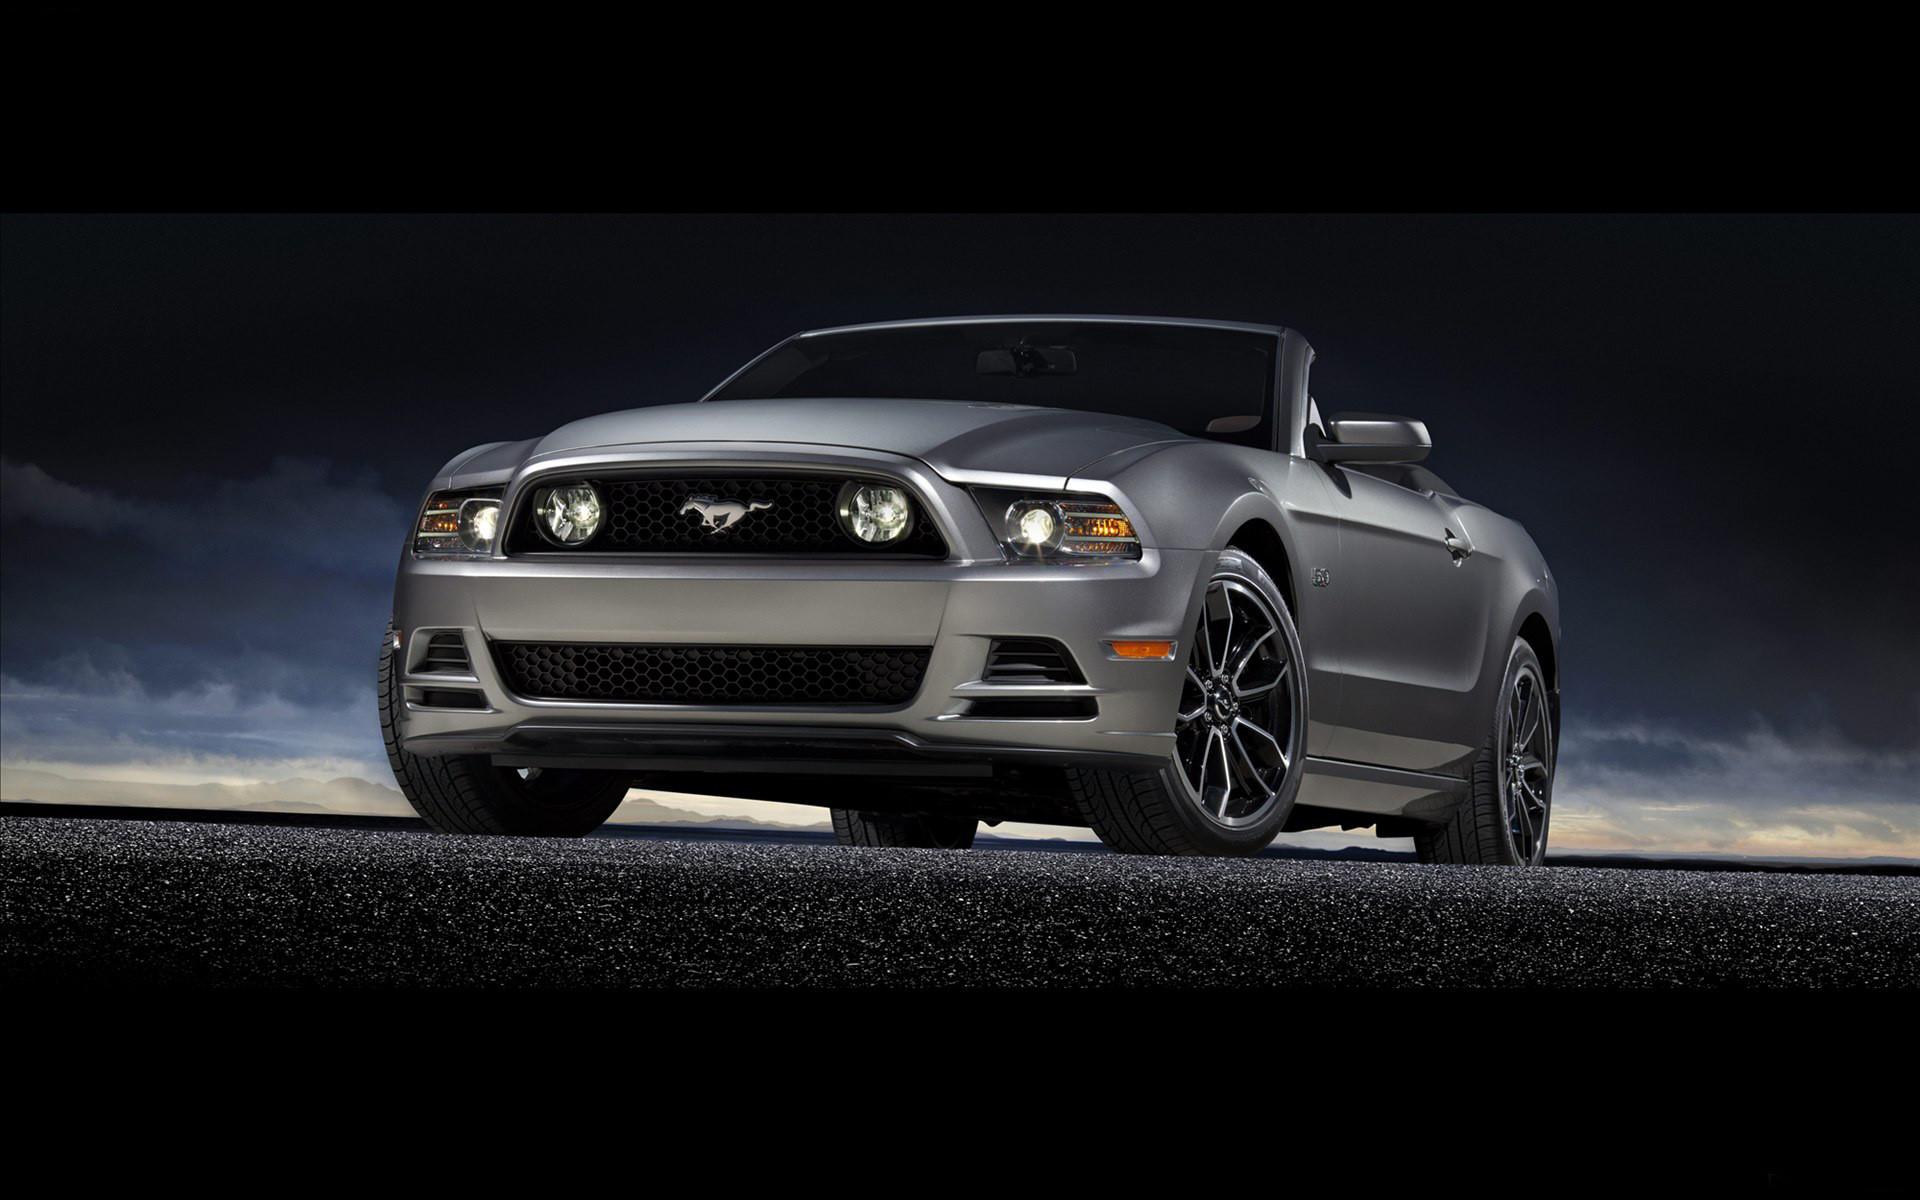 … Mustang Wallpapers 14 …